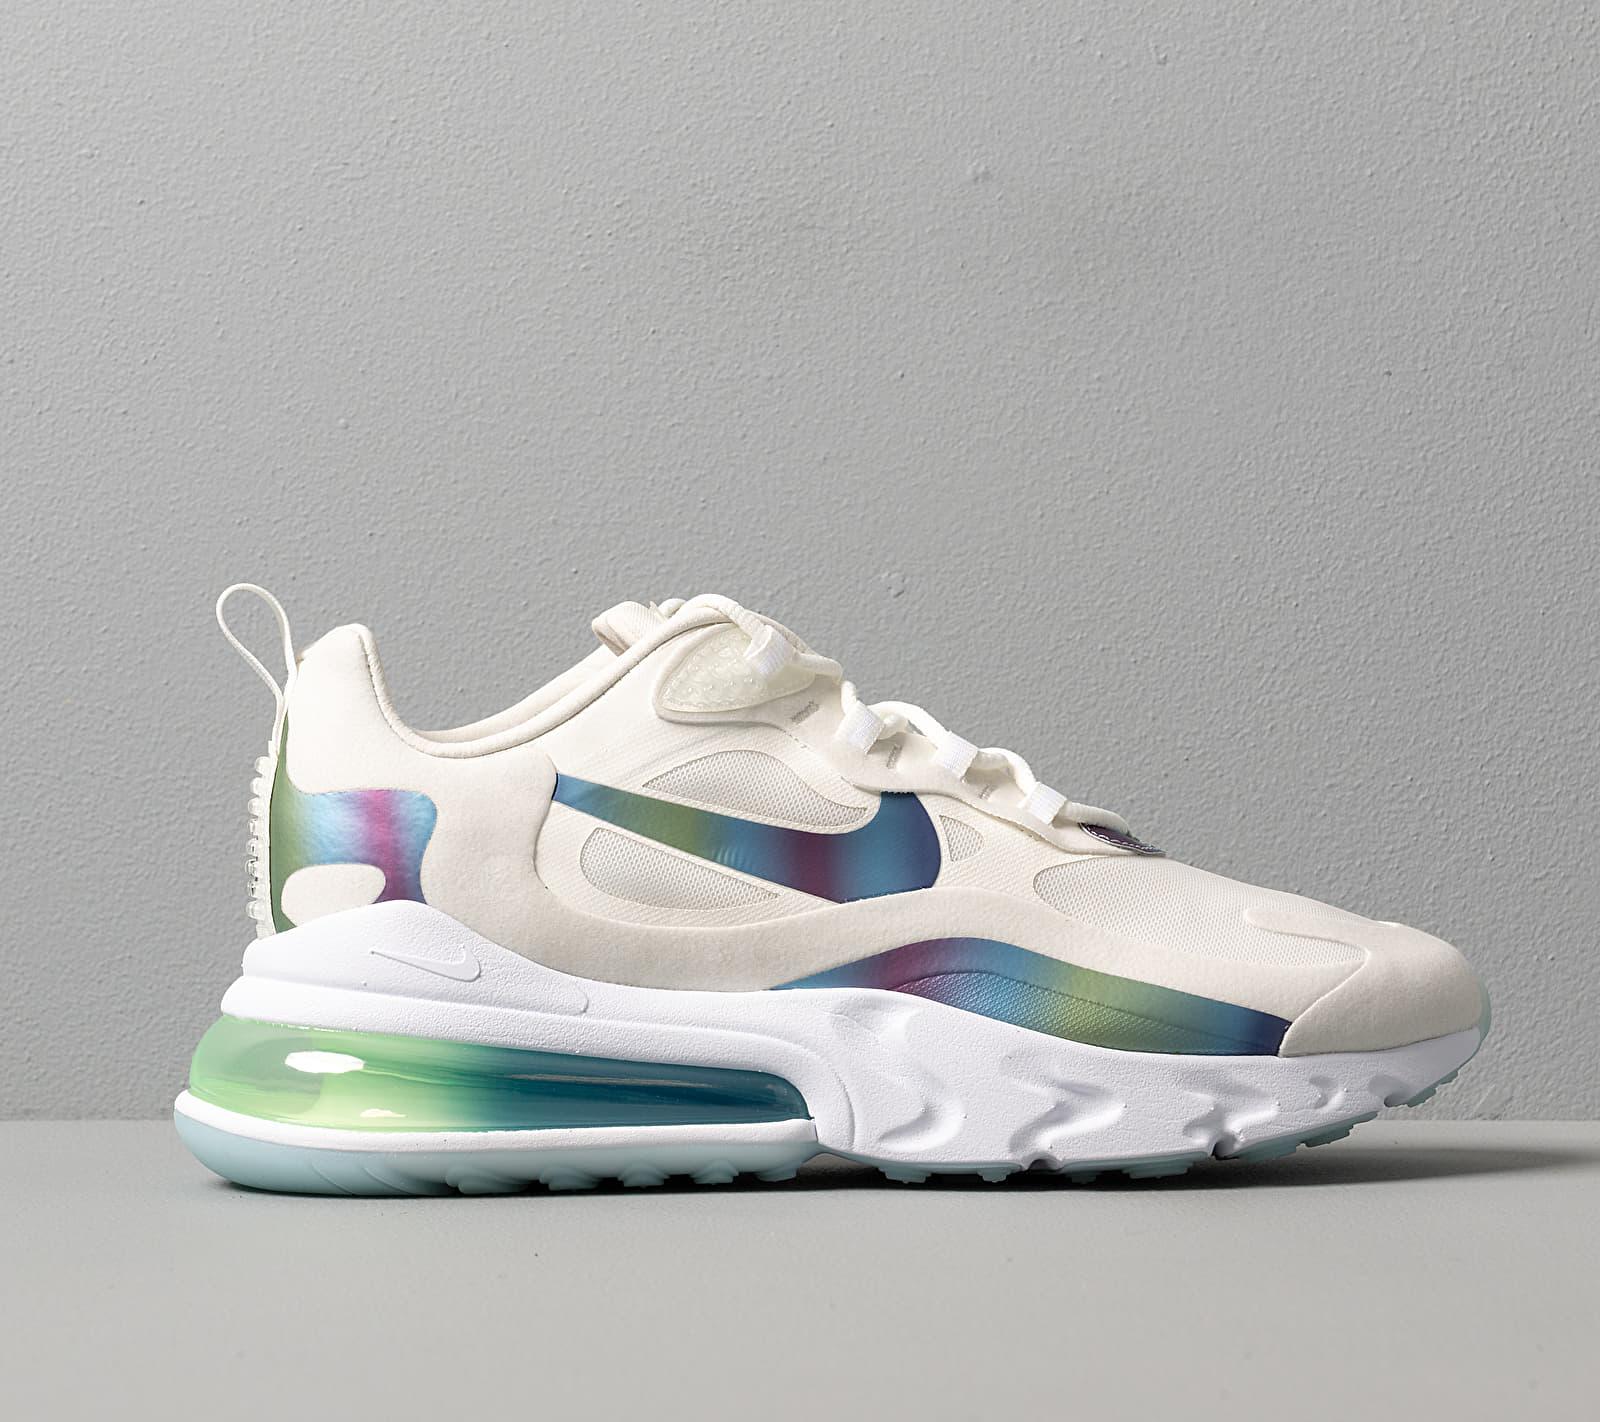 Nike Air Max 270 React 20 Summit White/ Multi-Color-Platinum Tint